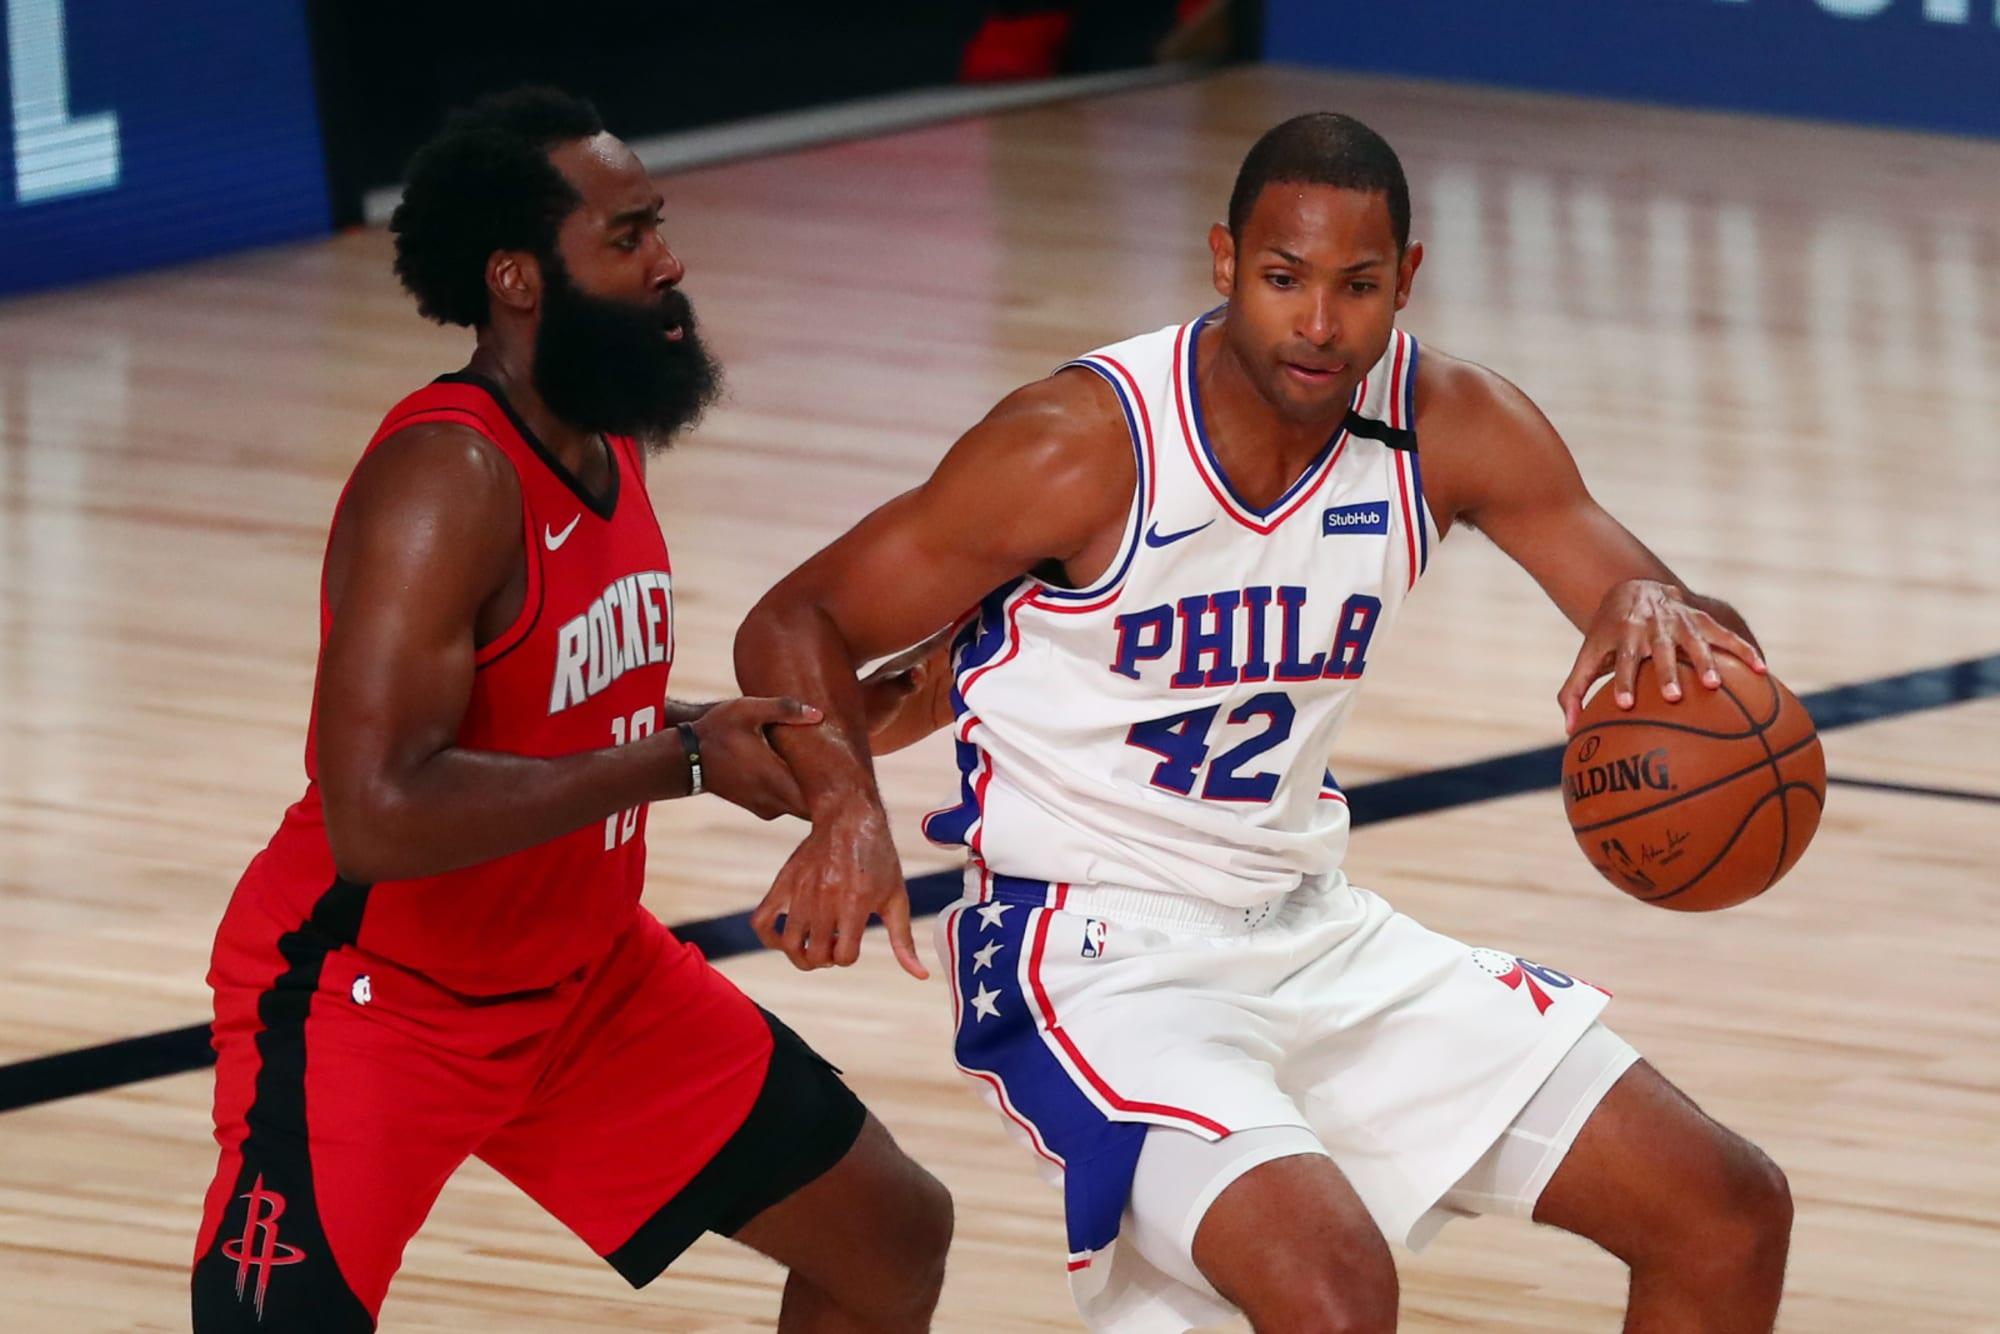 GRADES: Philadelphia 76ers 134, Houston Rockets 96